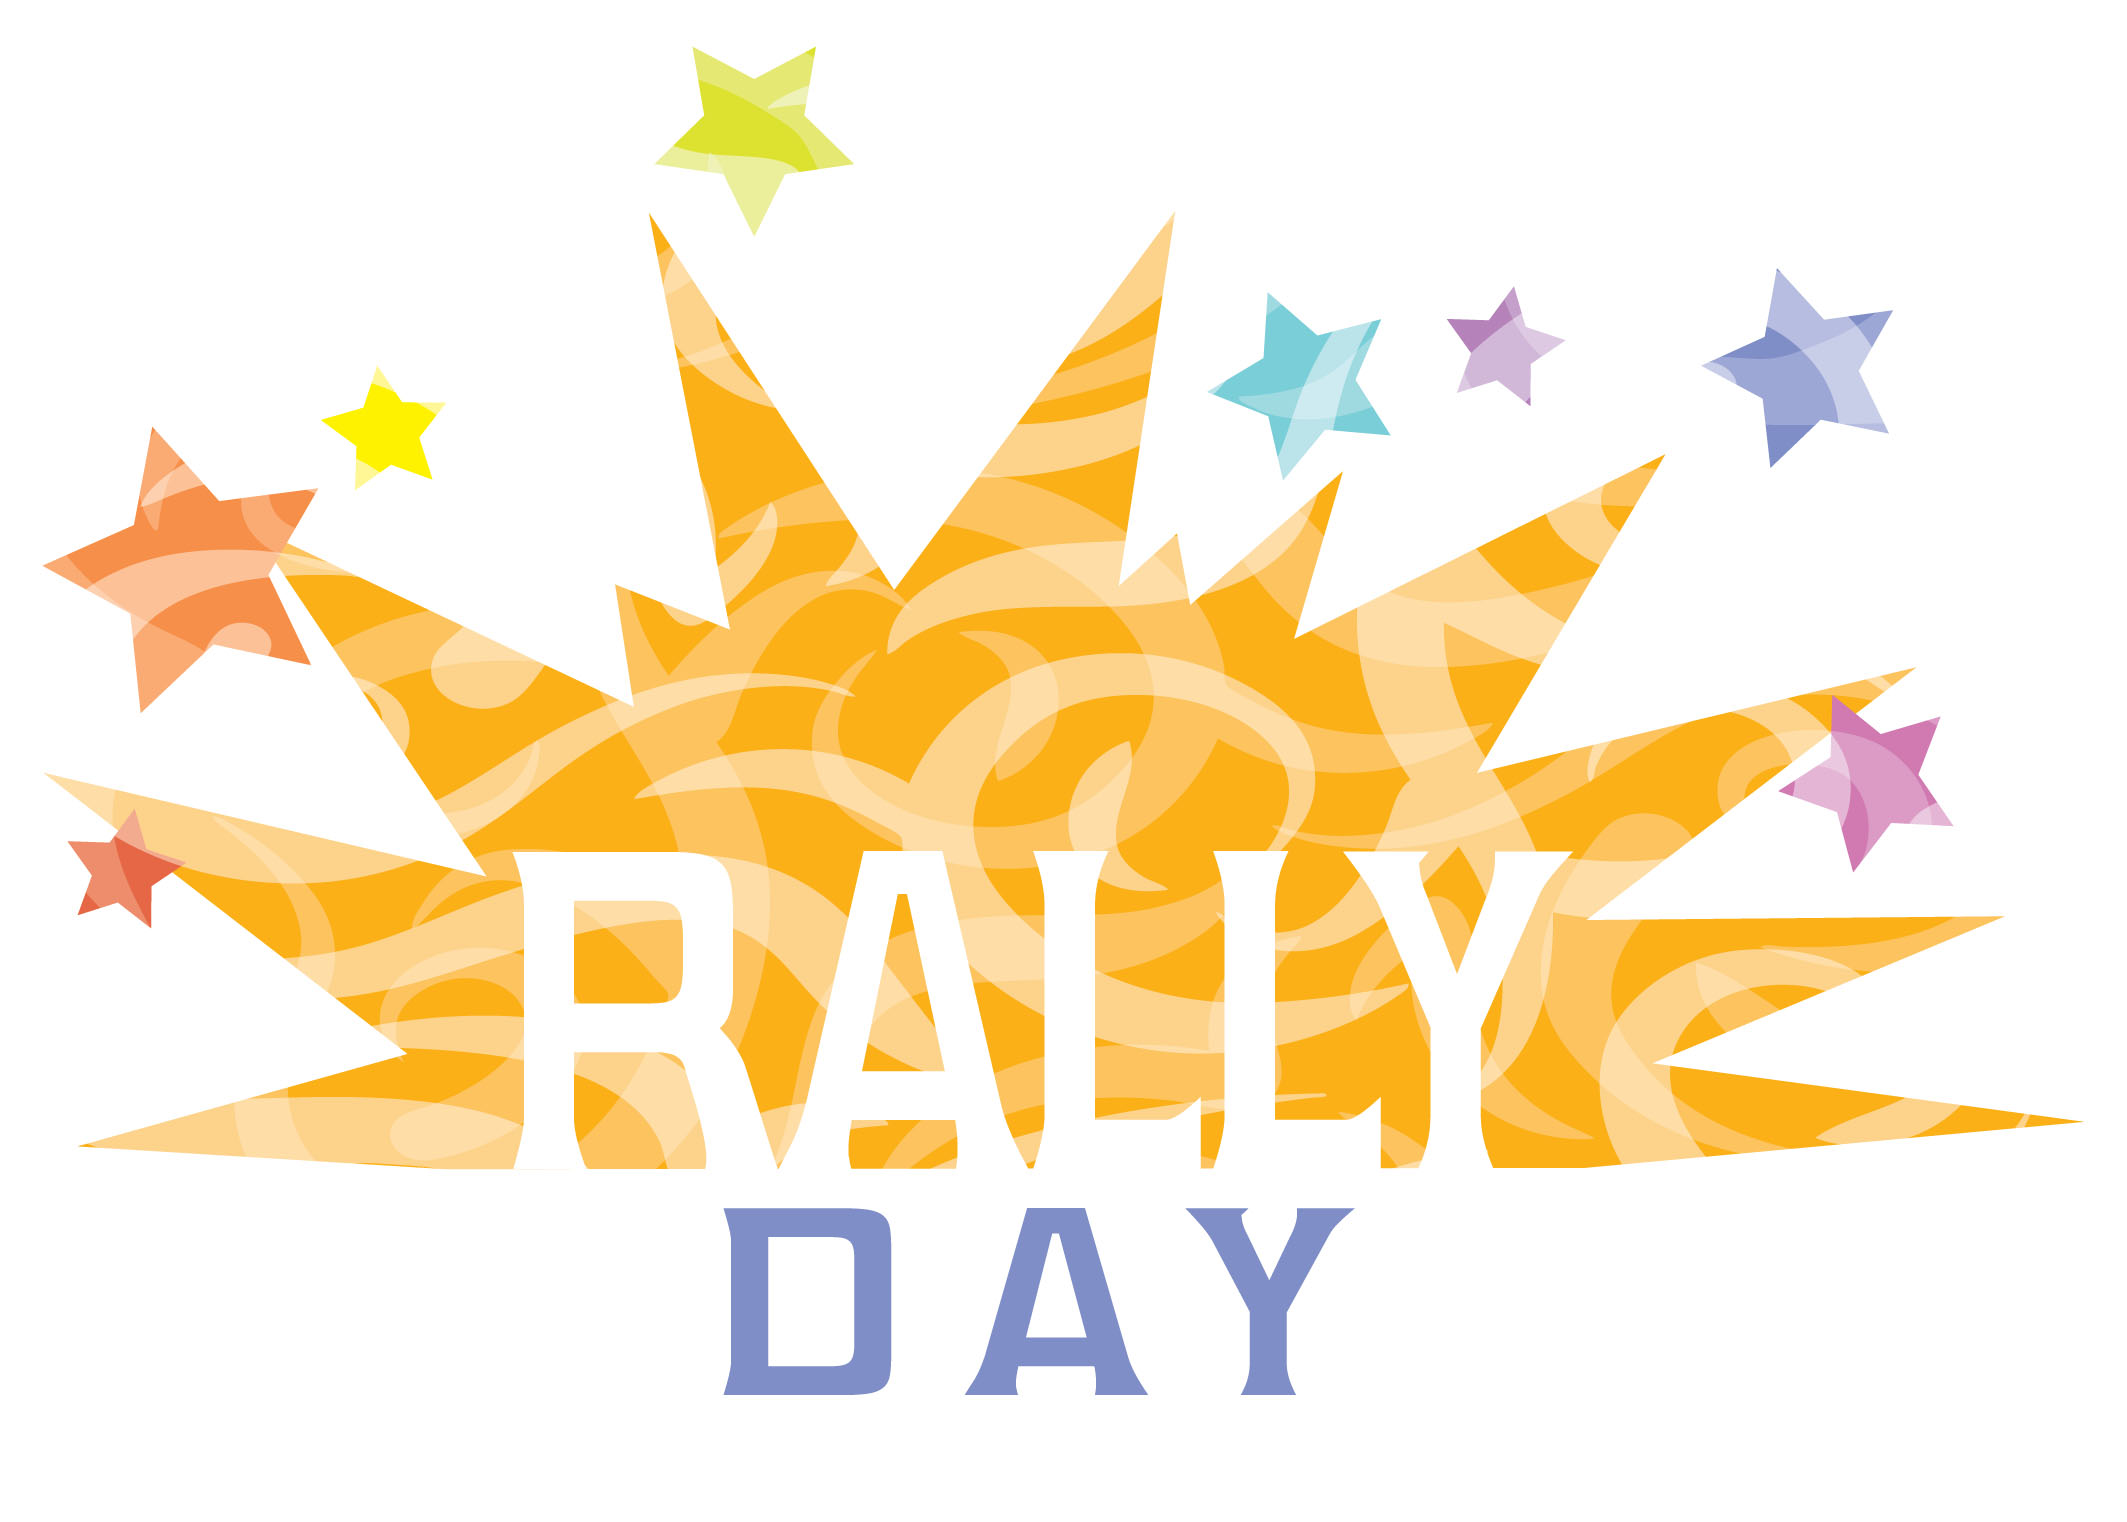 Sunday School Rally Day Clipart.